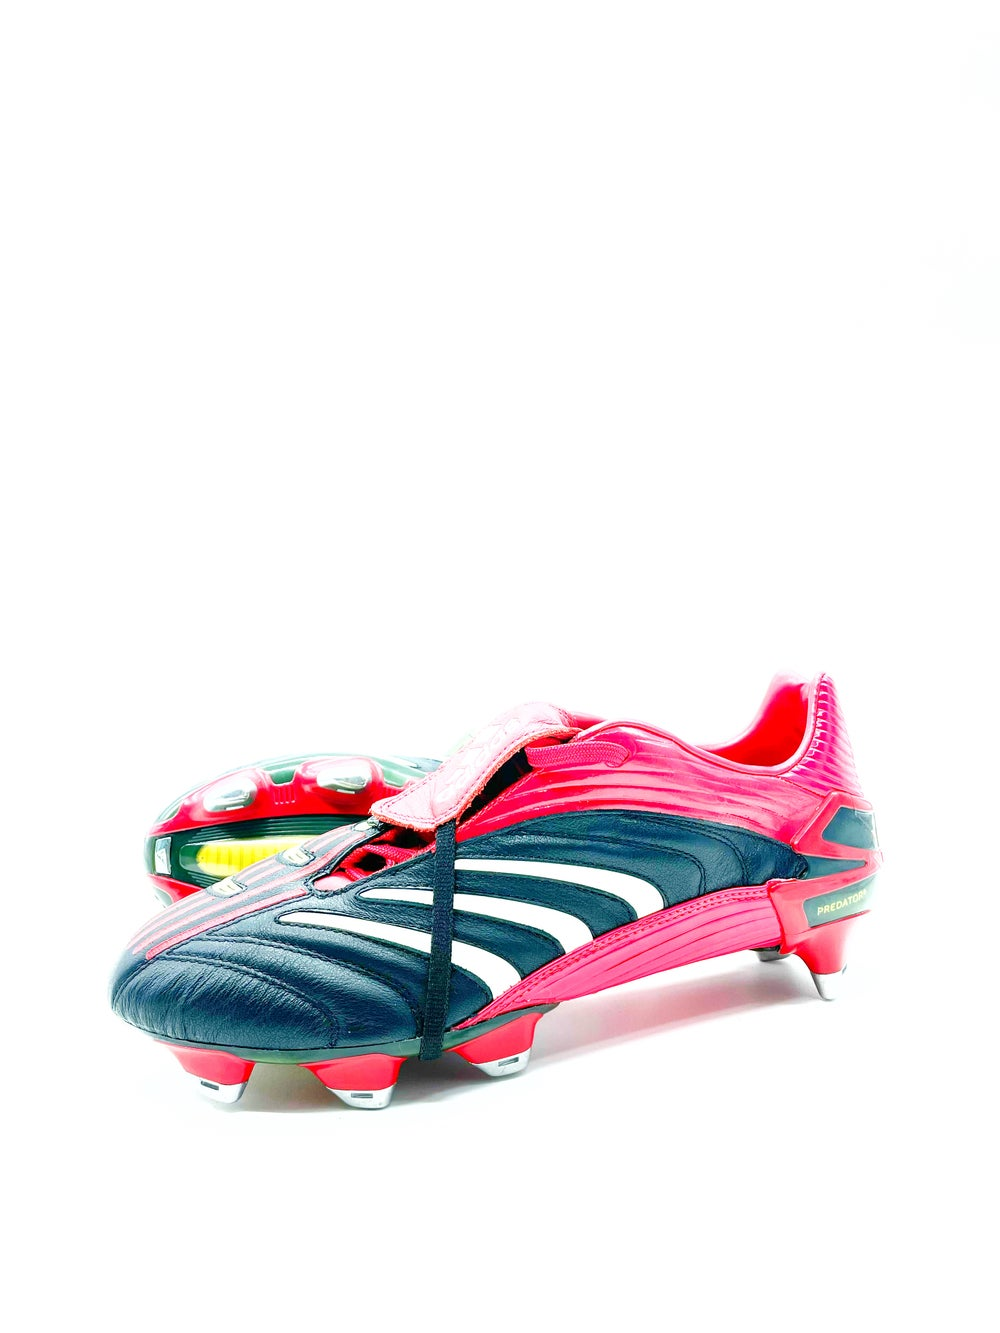 Image of Adidas Predator Absolute Sg Classic